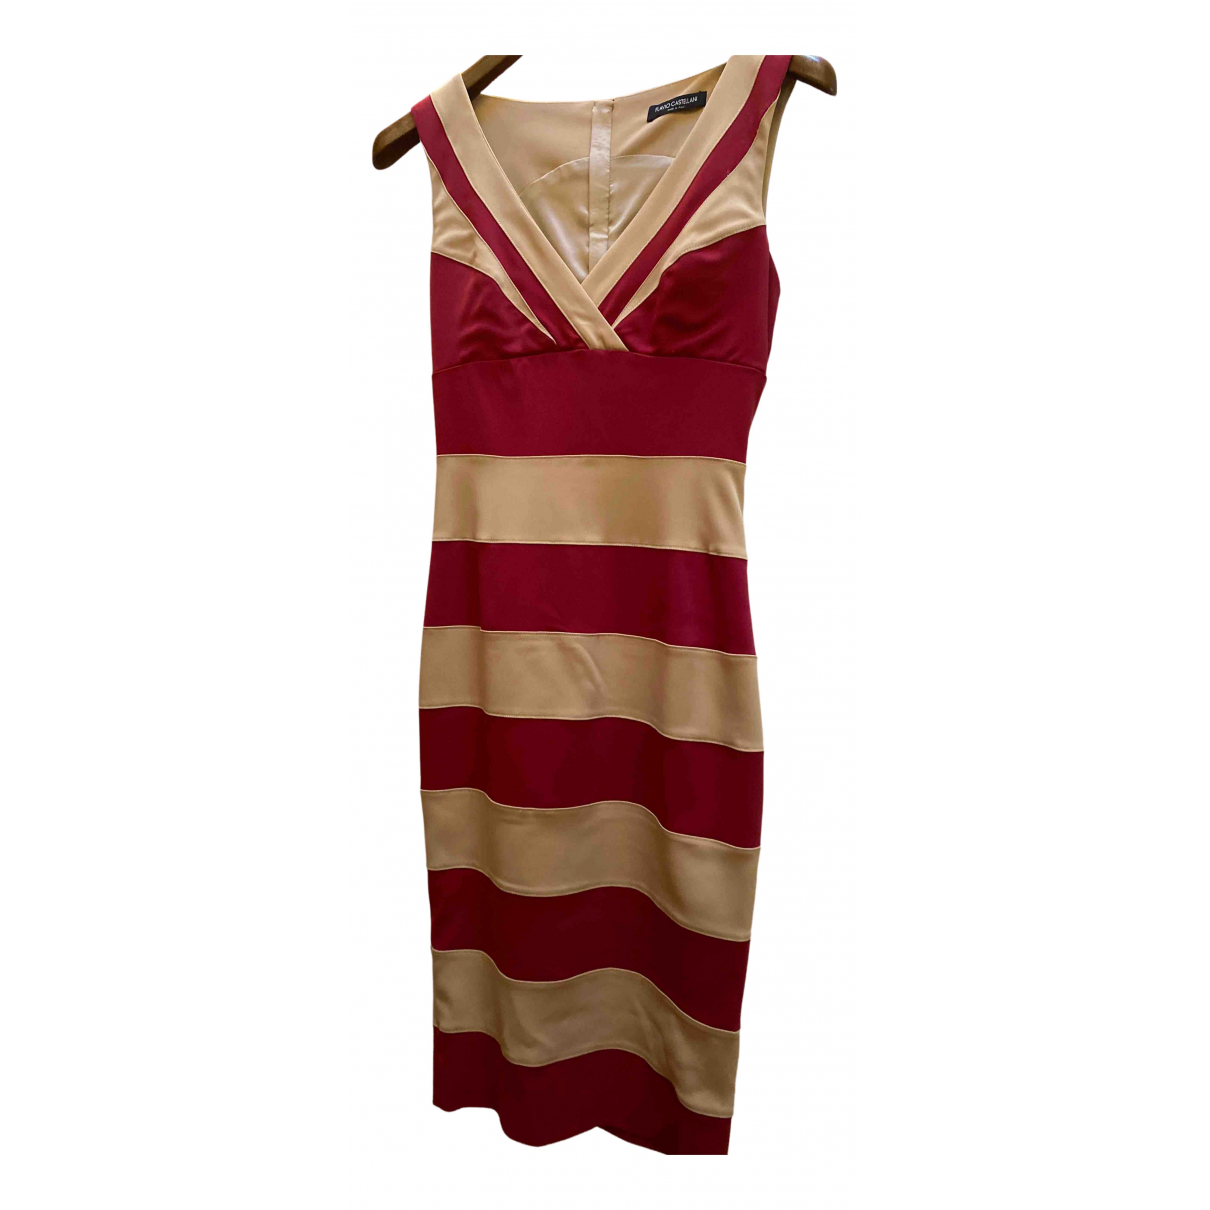 Flavio Castellani N Burgundy Cotton dress for Women 42 IT